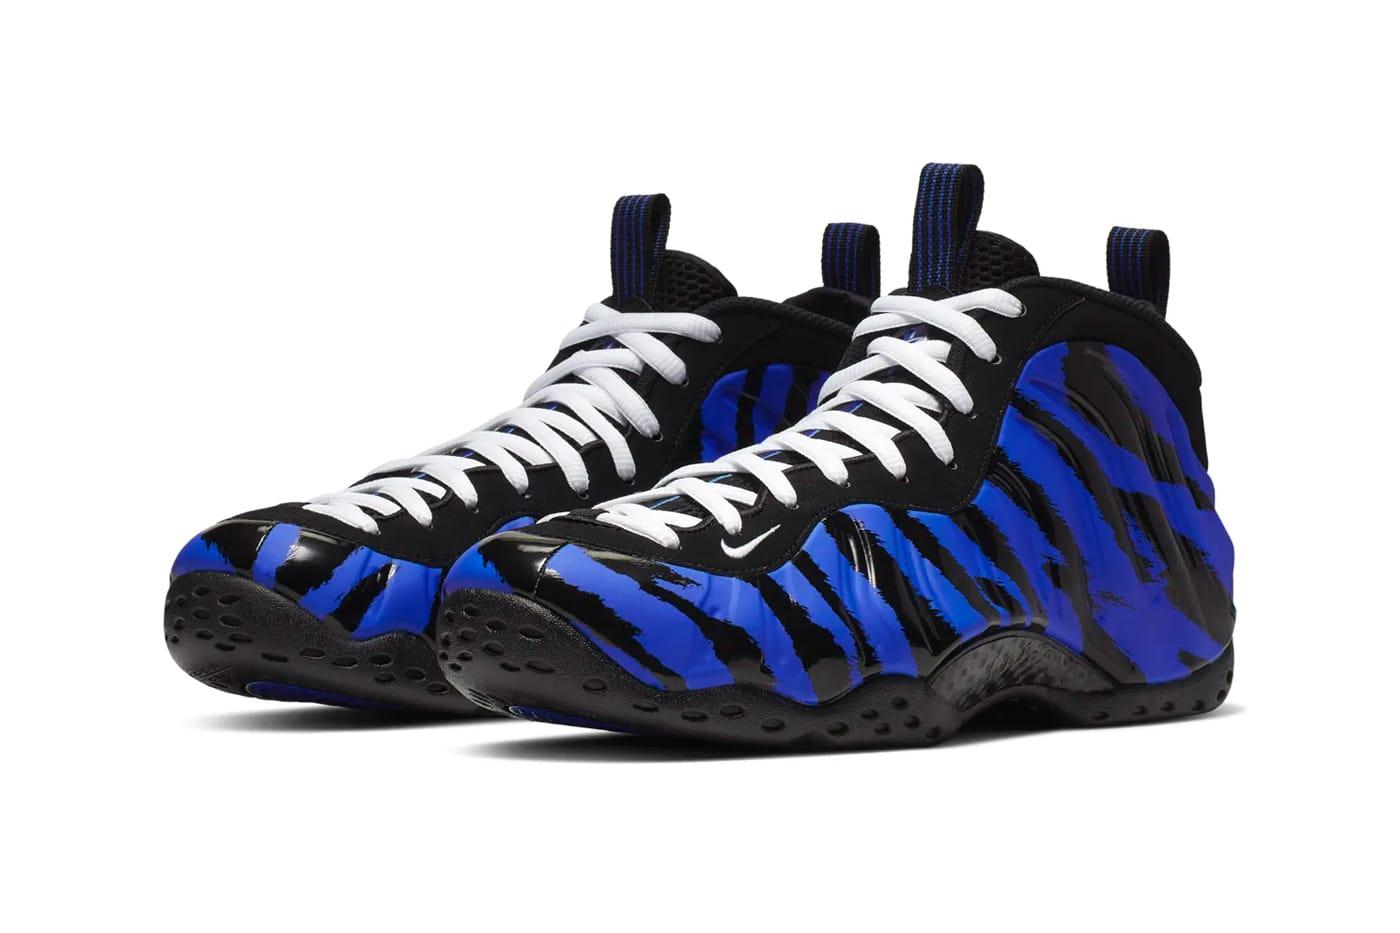 Mens Nike Air Foamposite One PRM Blue Mirror size ... eBay